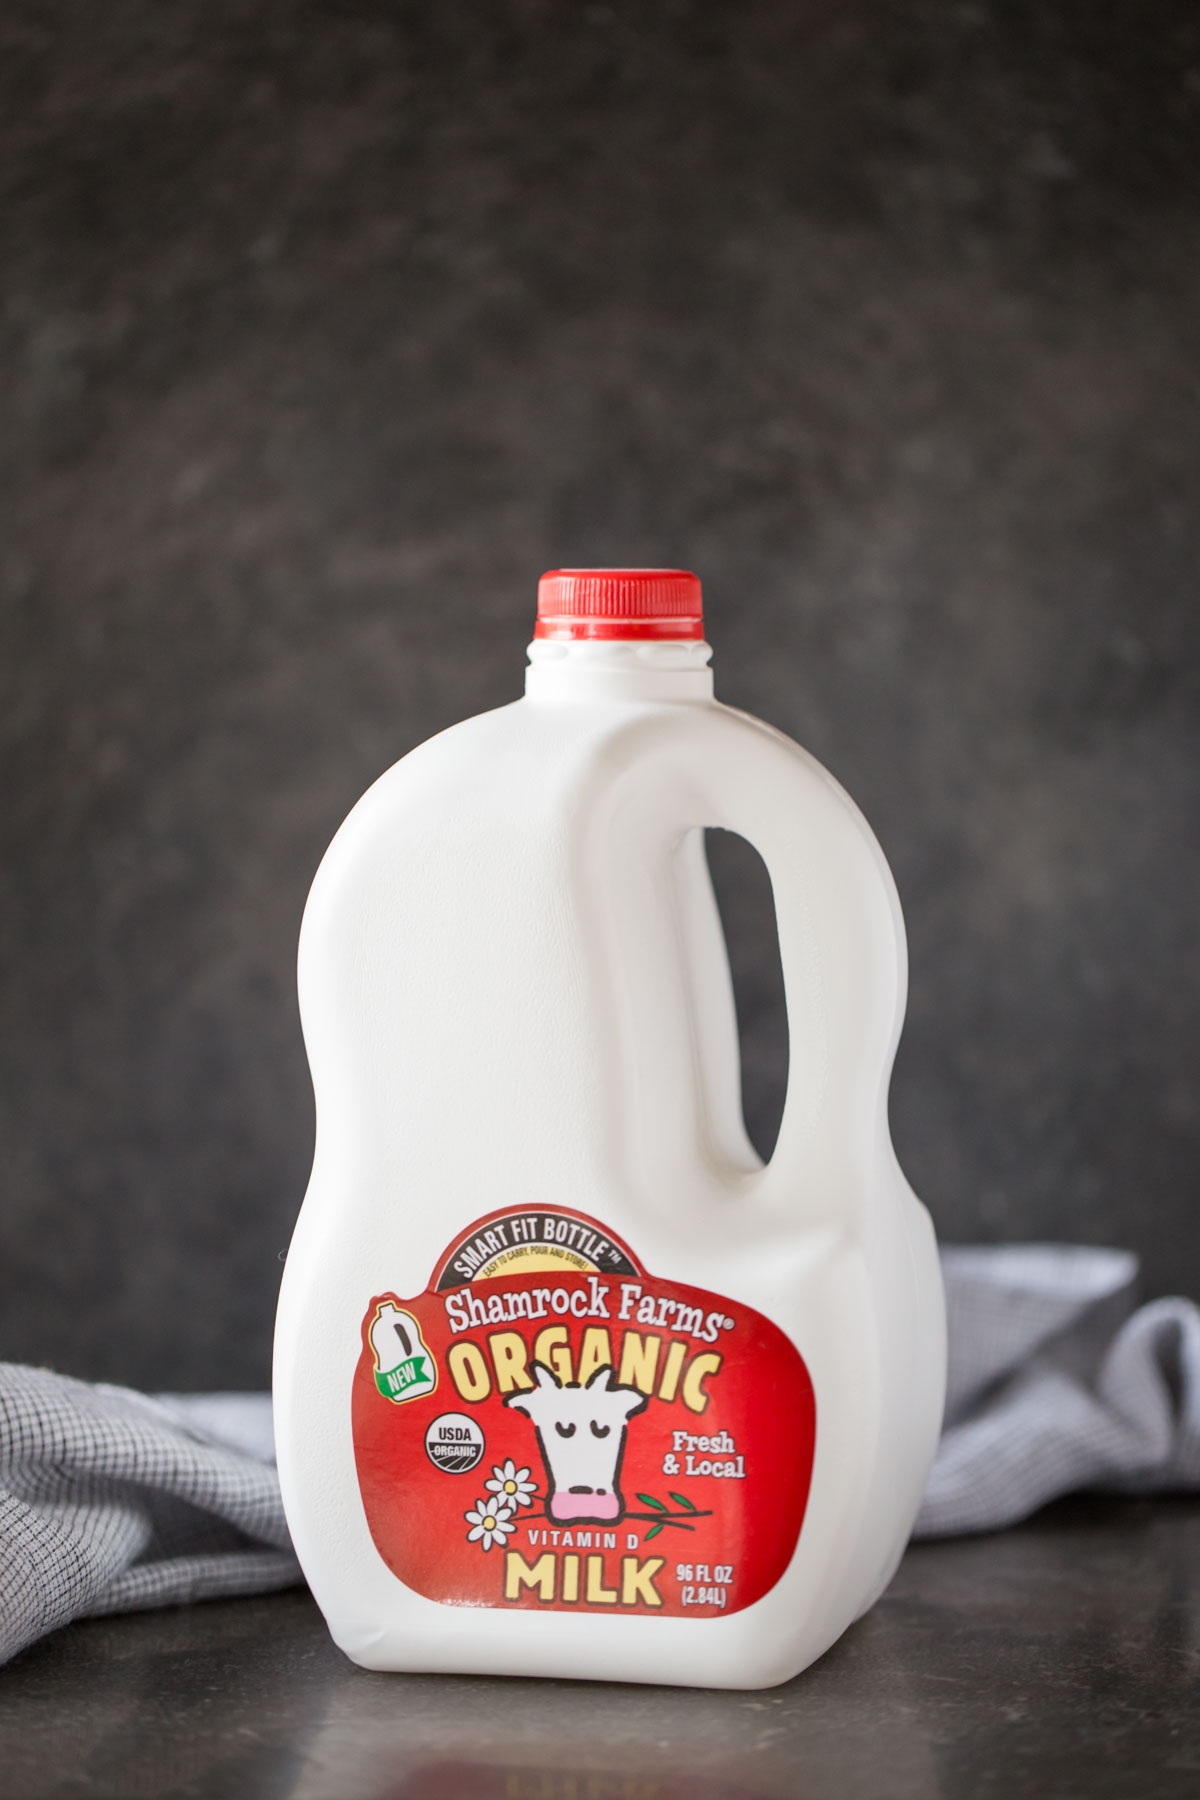 A Shamrock Farms Organic Milk jug for the Chia Pudding Parfaits.